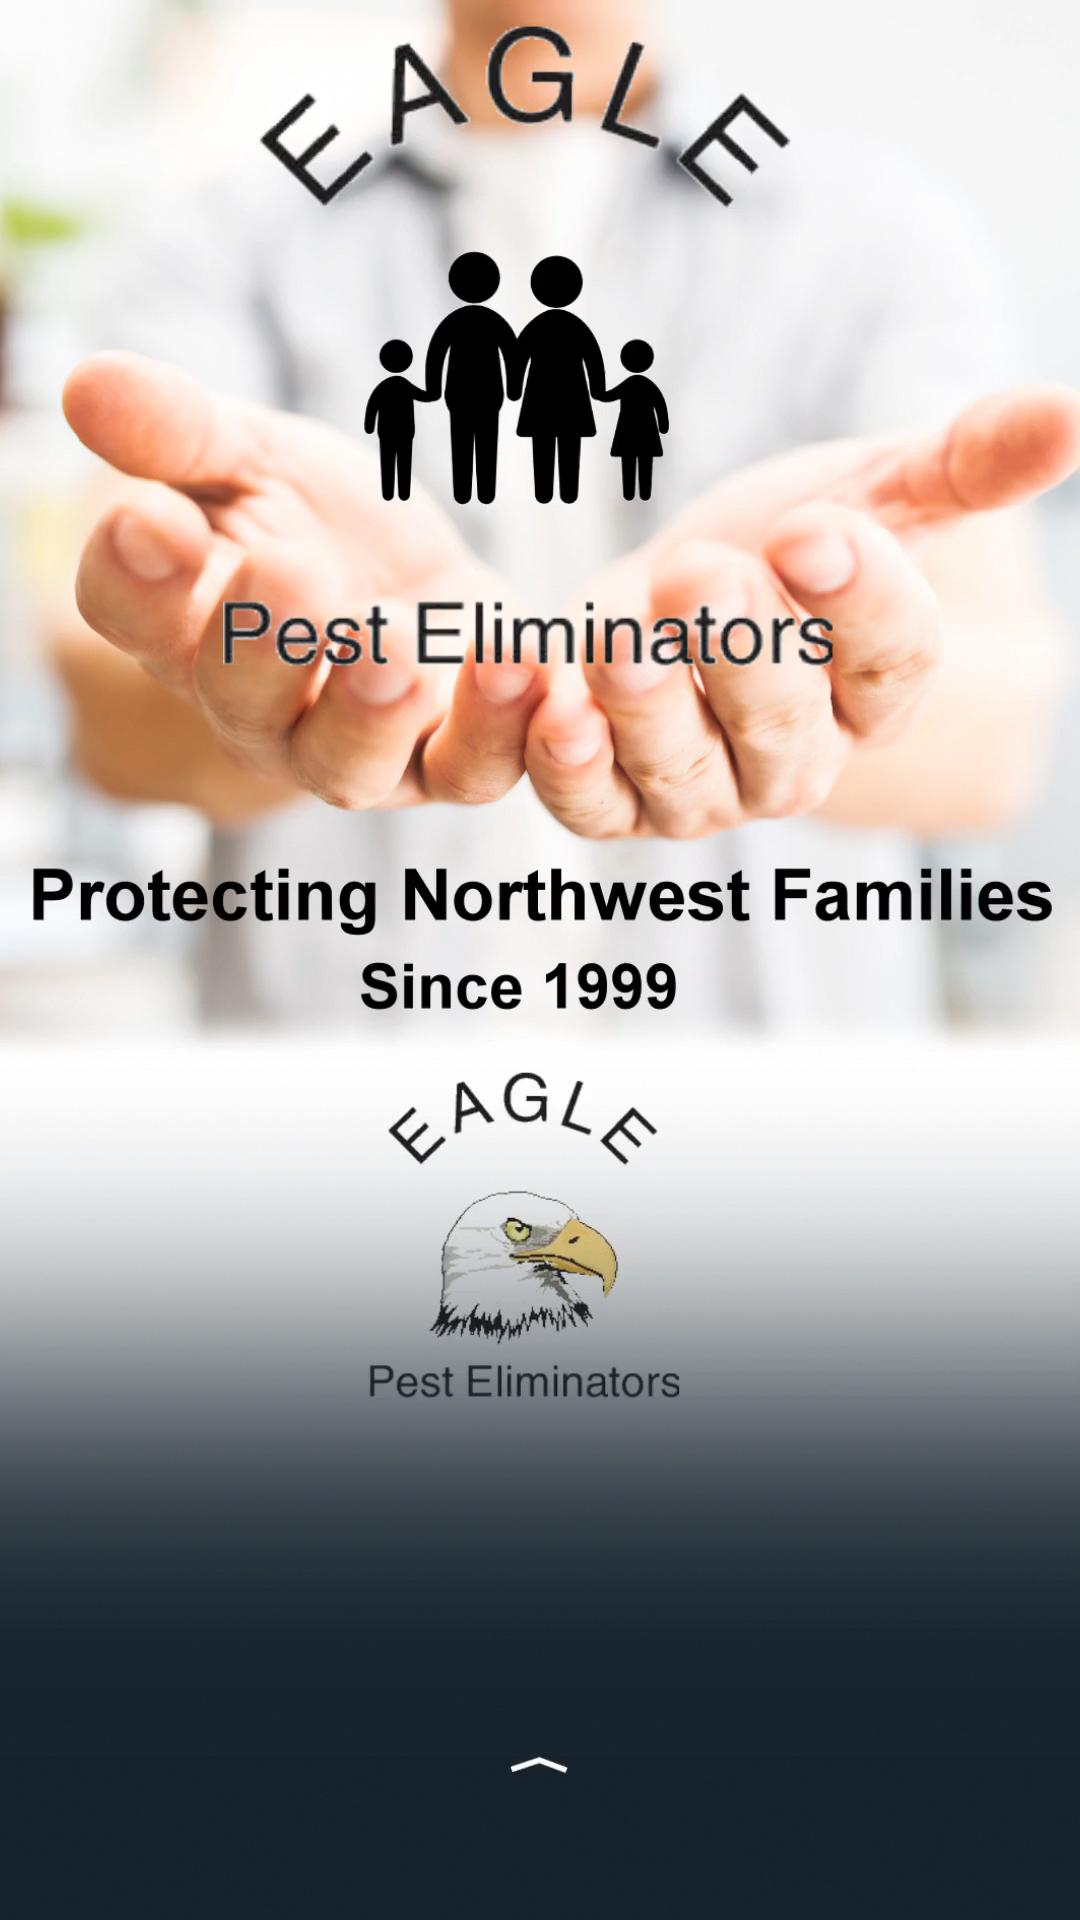 Rodentcontrol Pest Control Pests Flea Prevention